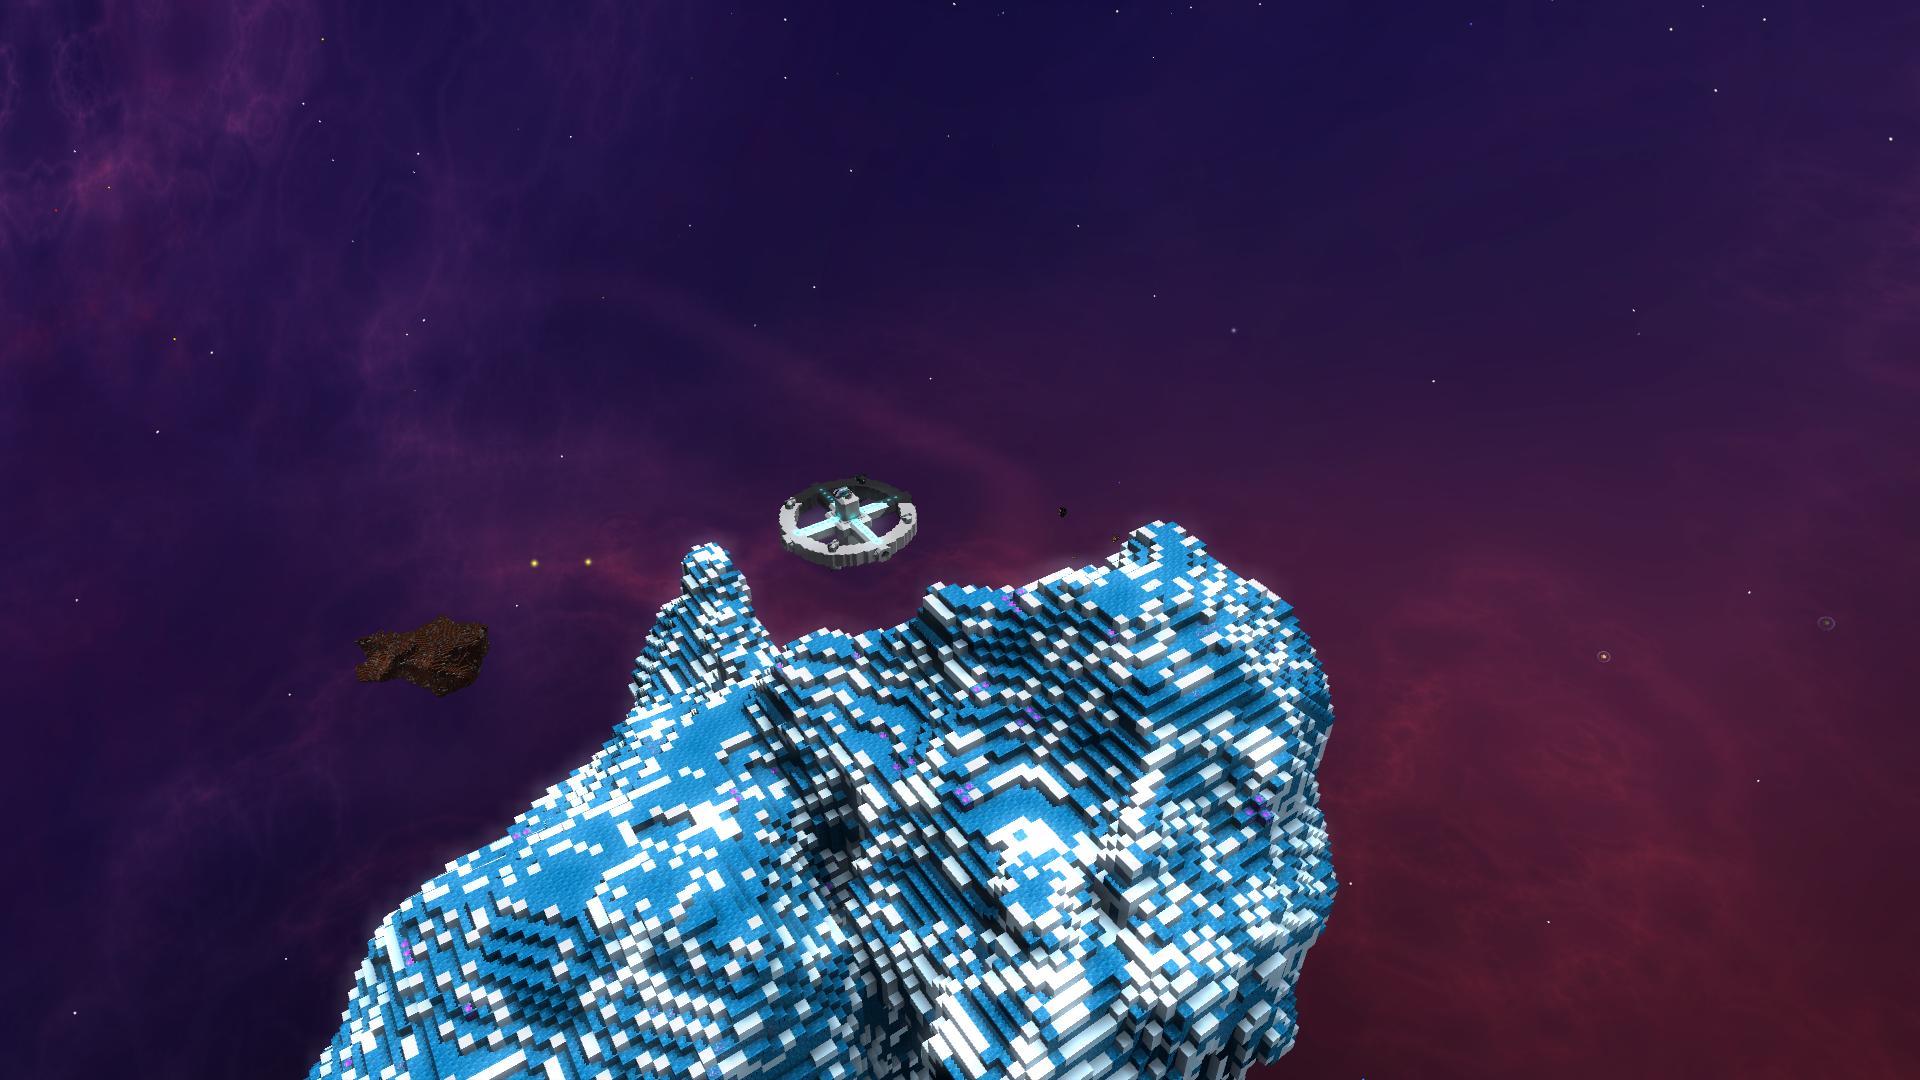 starmade-screenshot-0833.png